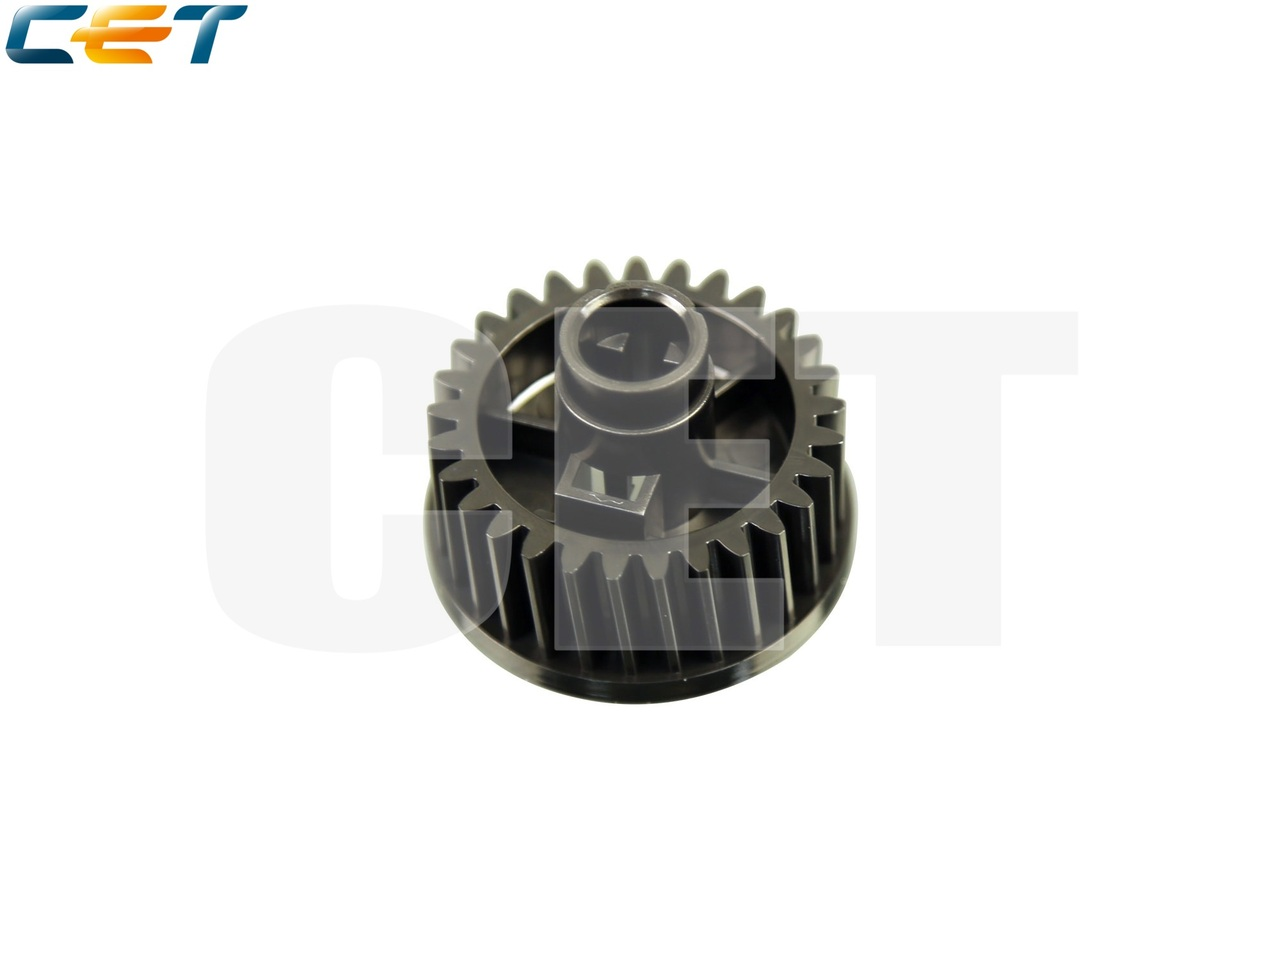 Шестерня привода резинового вала 29T RU6-8293-000 для HPLaserJet Pro MFP M521/M525 (CET), CET2732